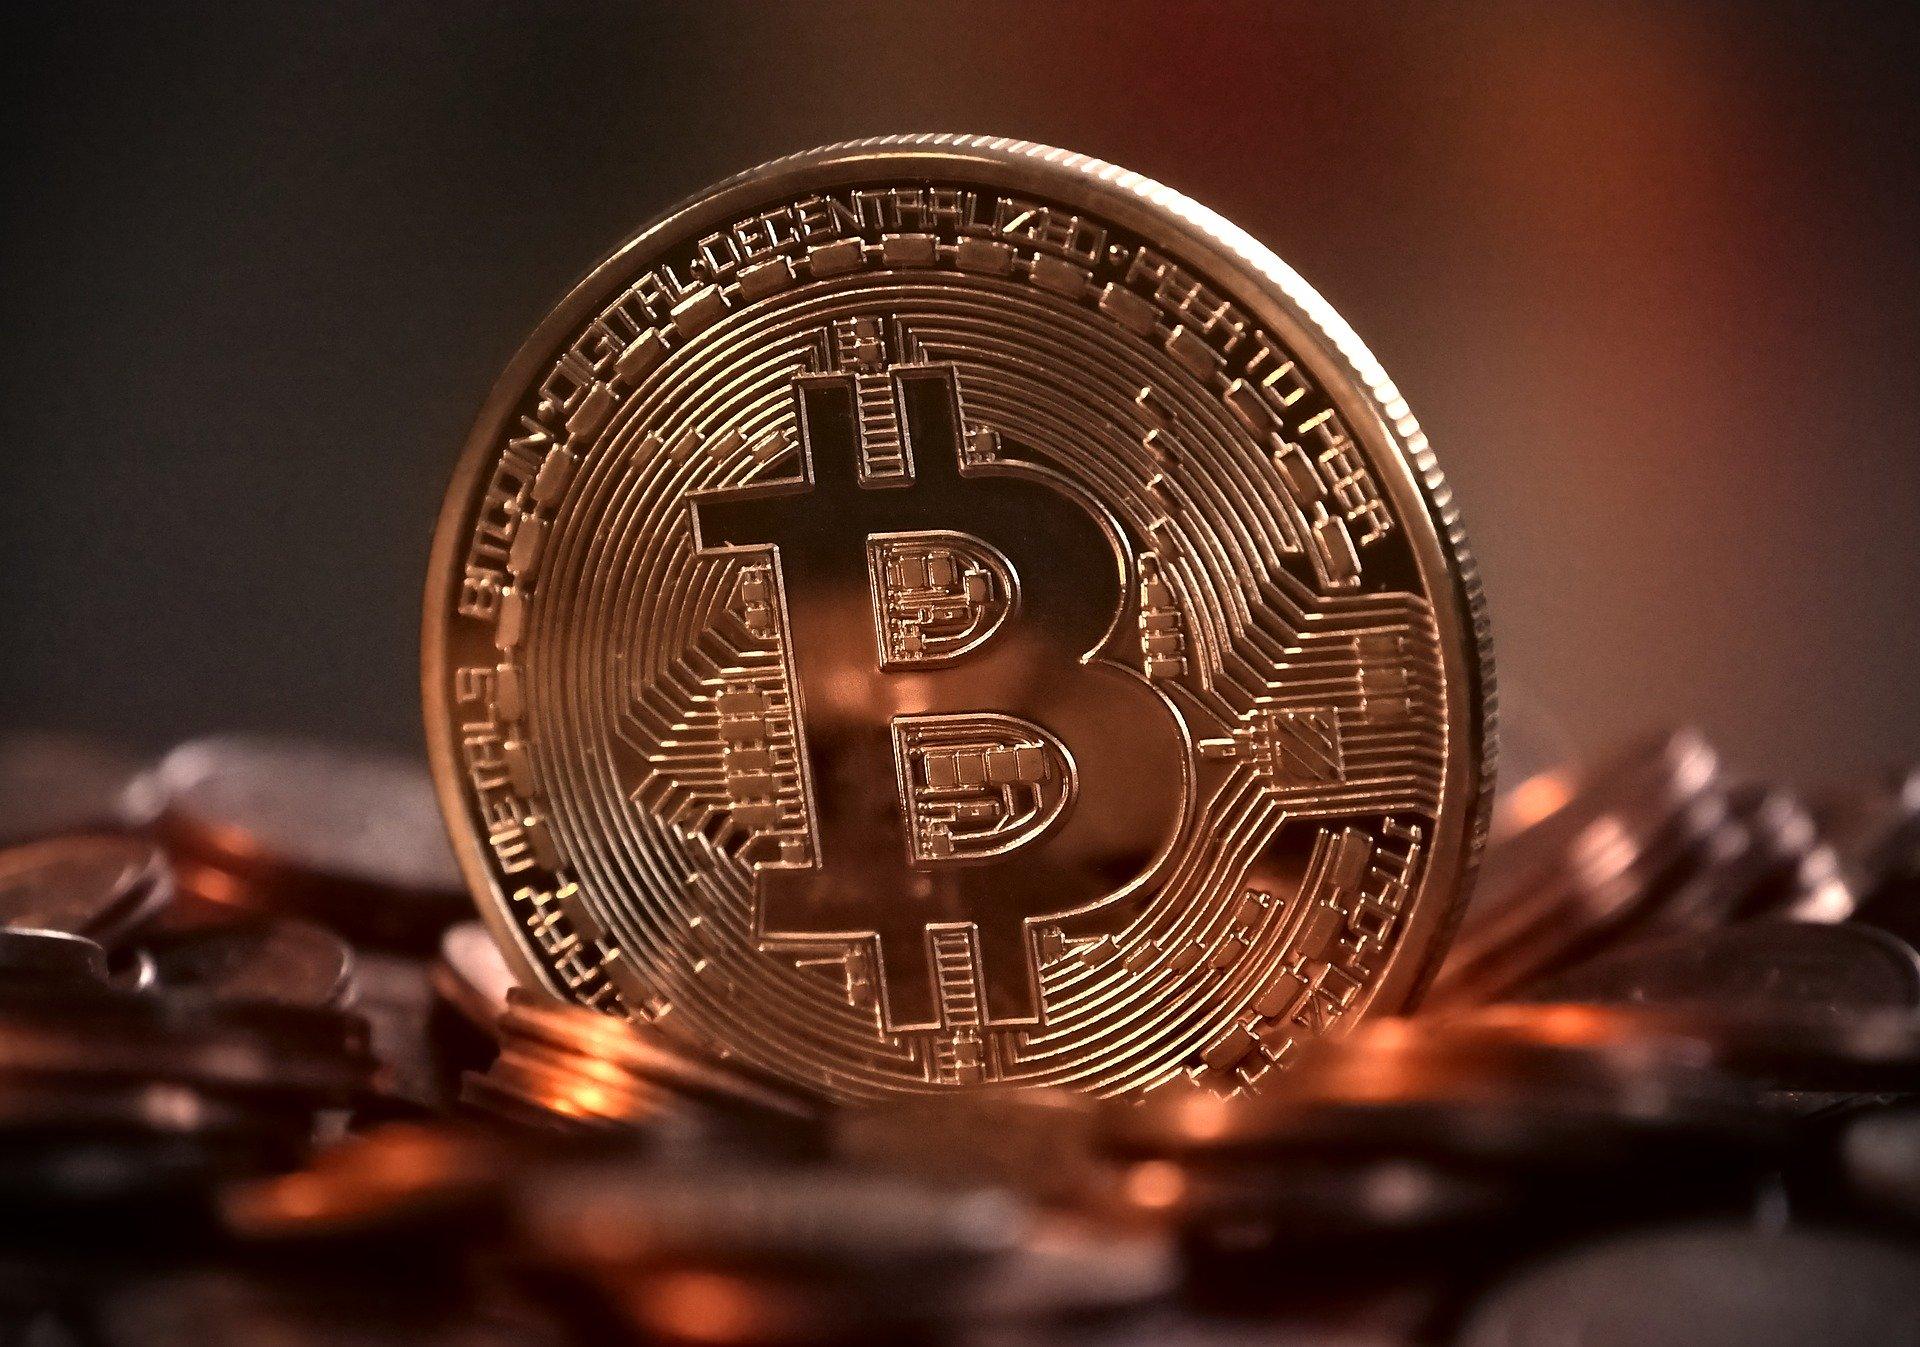 Die Bitcoin Era in Italien hat positiven Einfluss